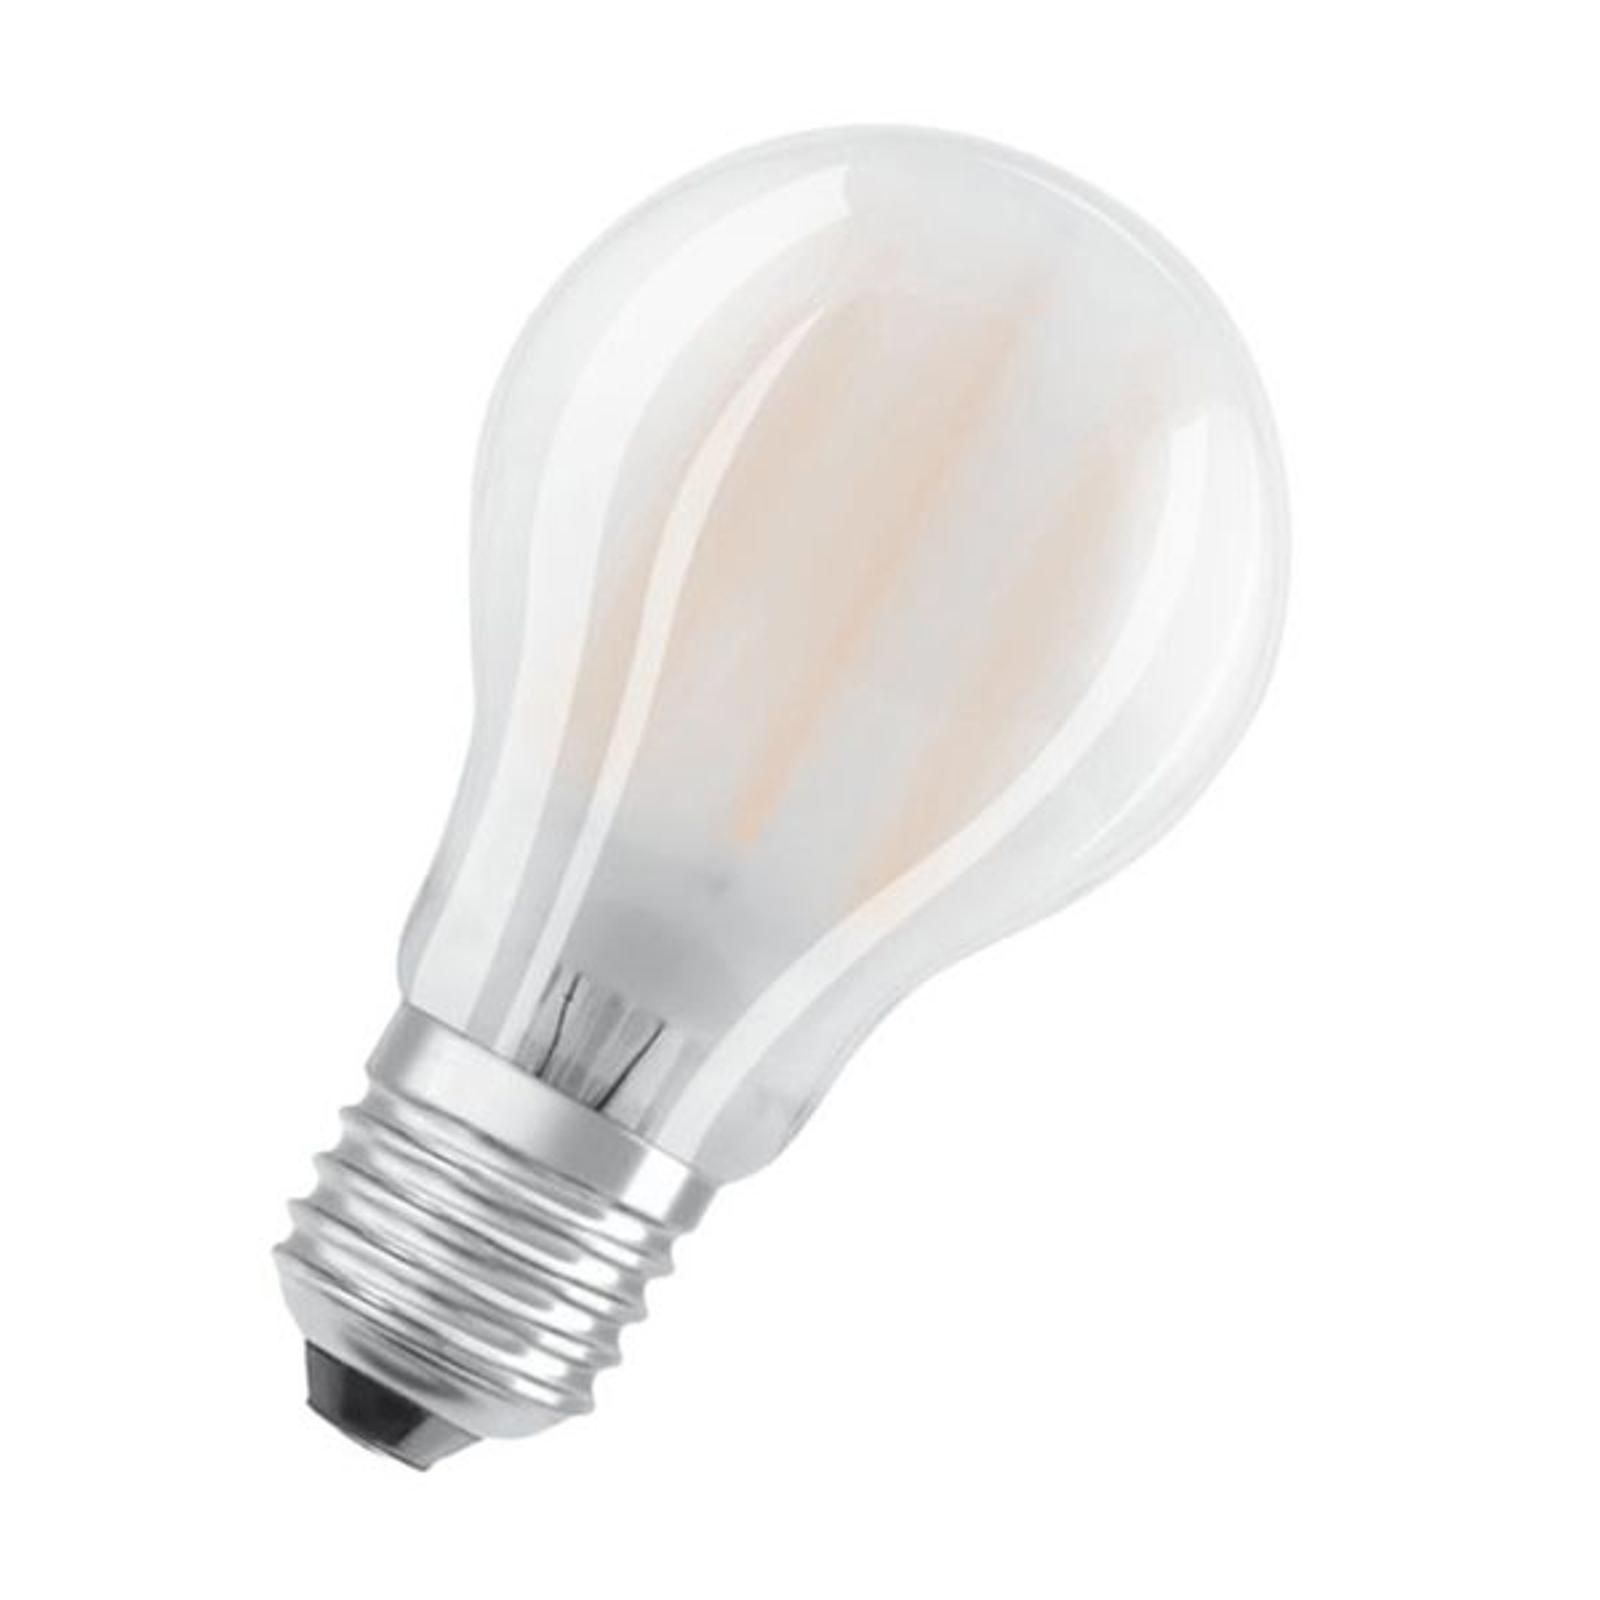 OSRAM Classic A LED-Lampe E27 1,5W 2.700K matt